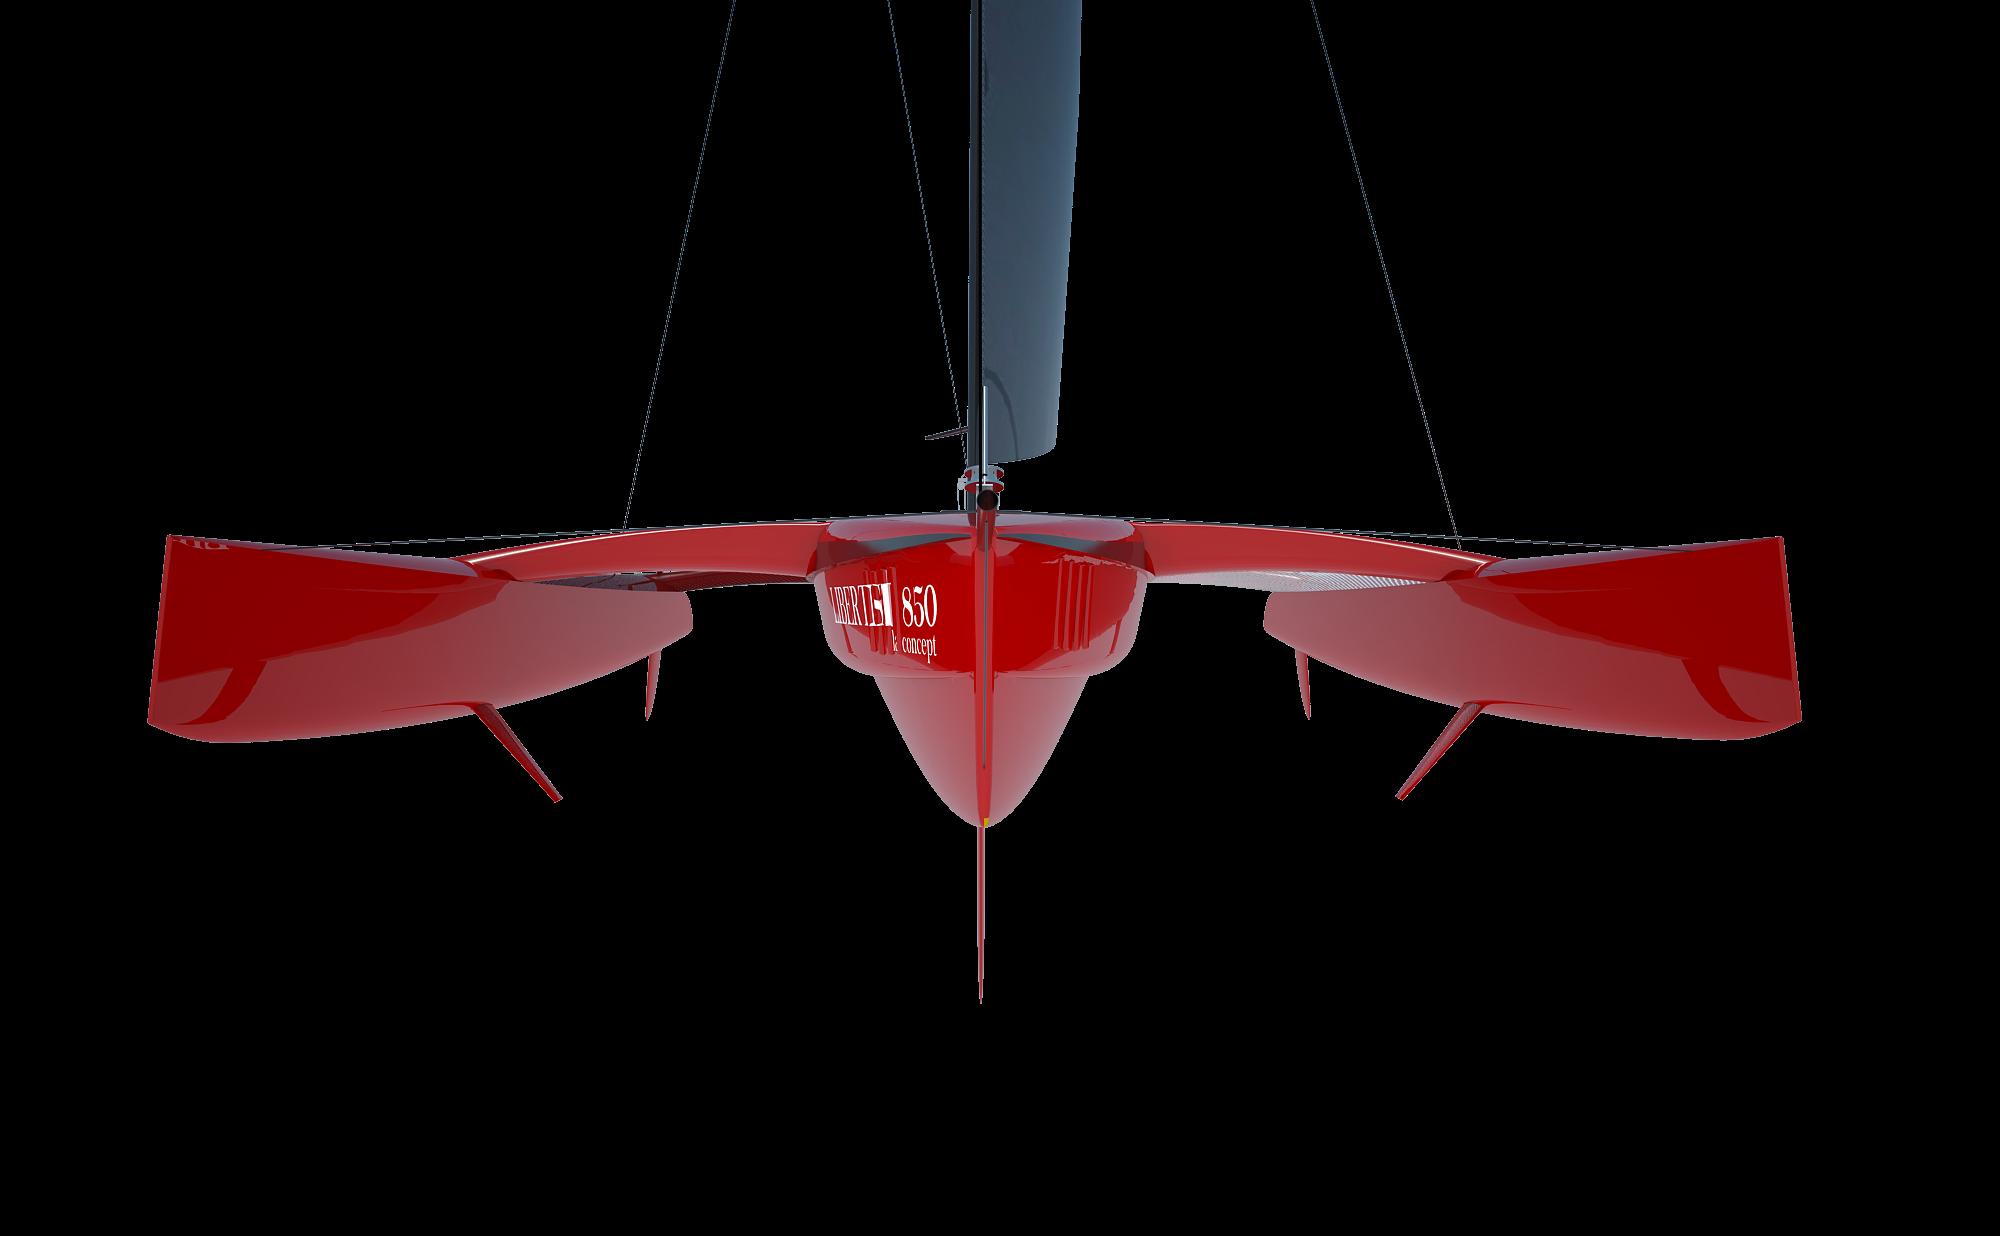 BoatYard Libertist 850